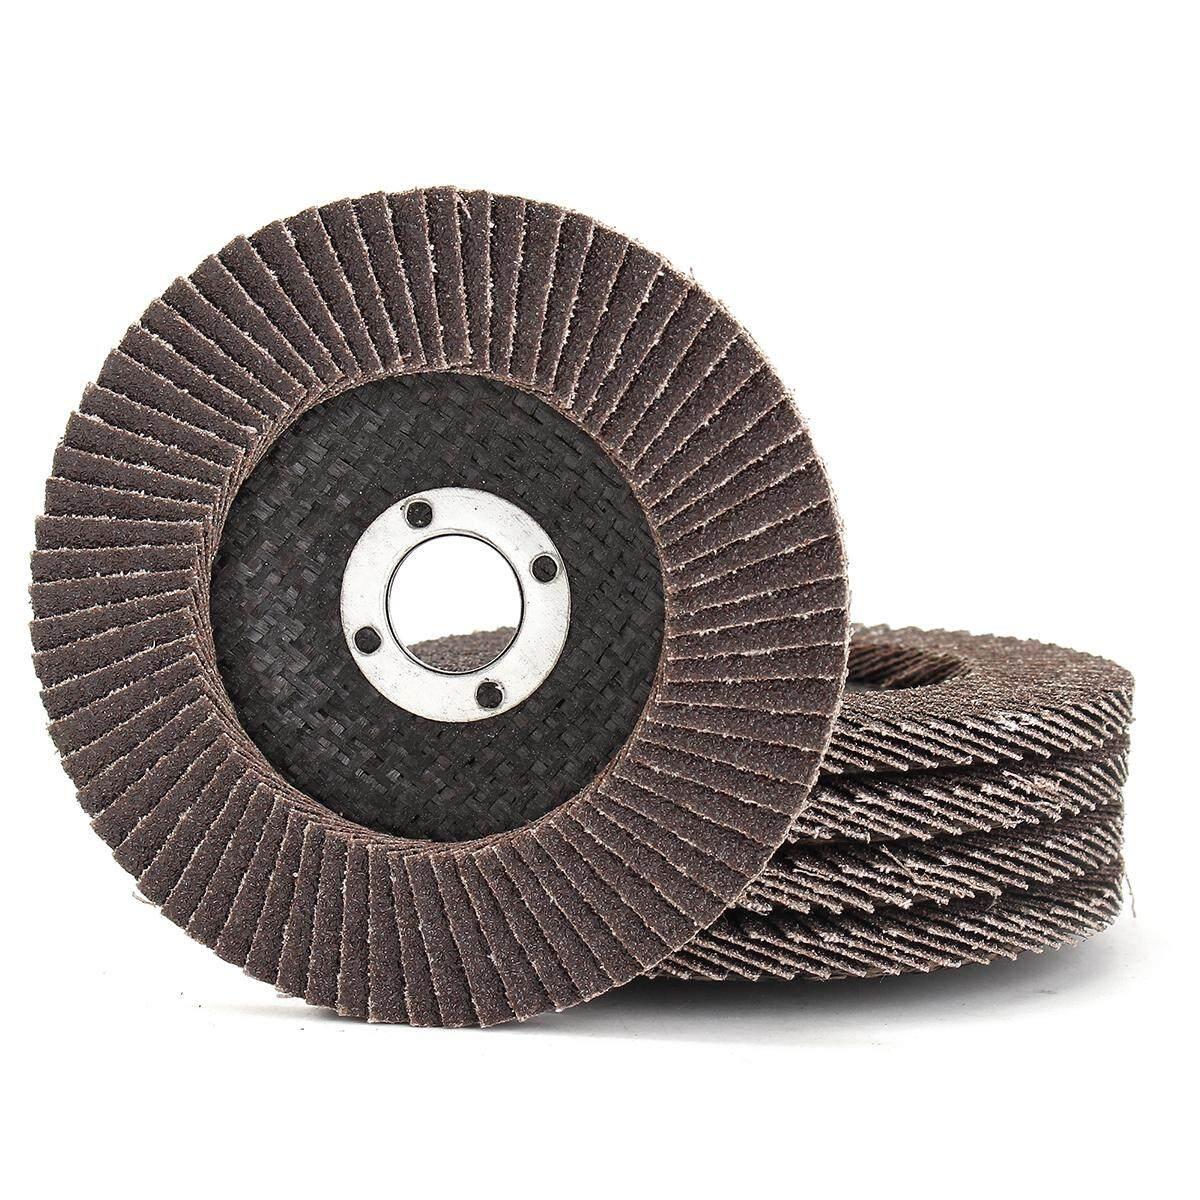 1pc 100MM 4 80 GRIT FLAP DISCS Zirconia Angle Grinder Wheels Metal Wood Sanding